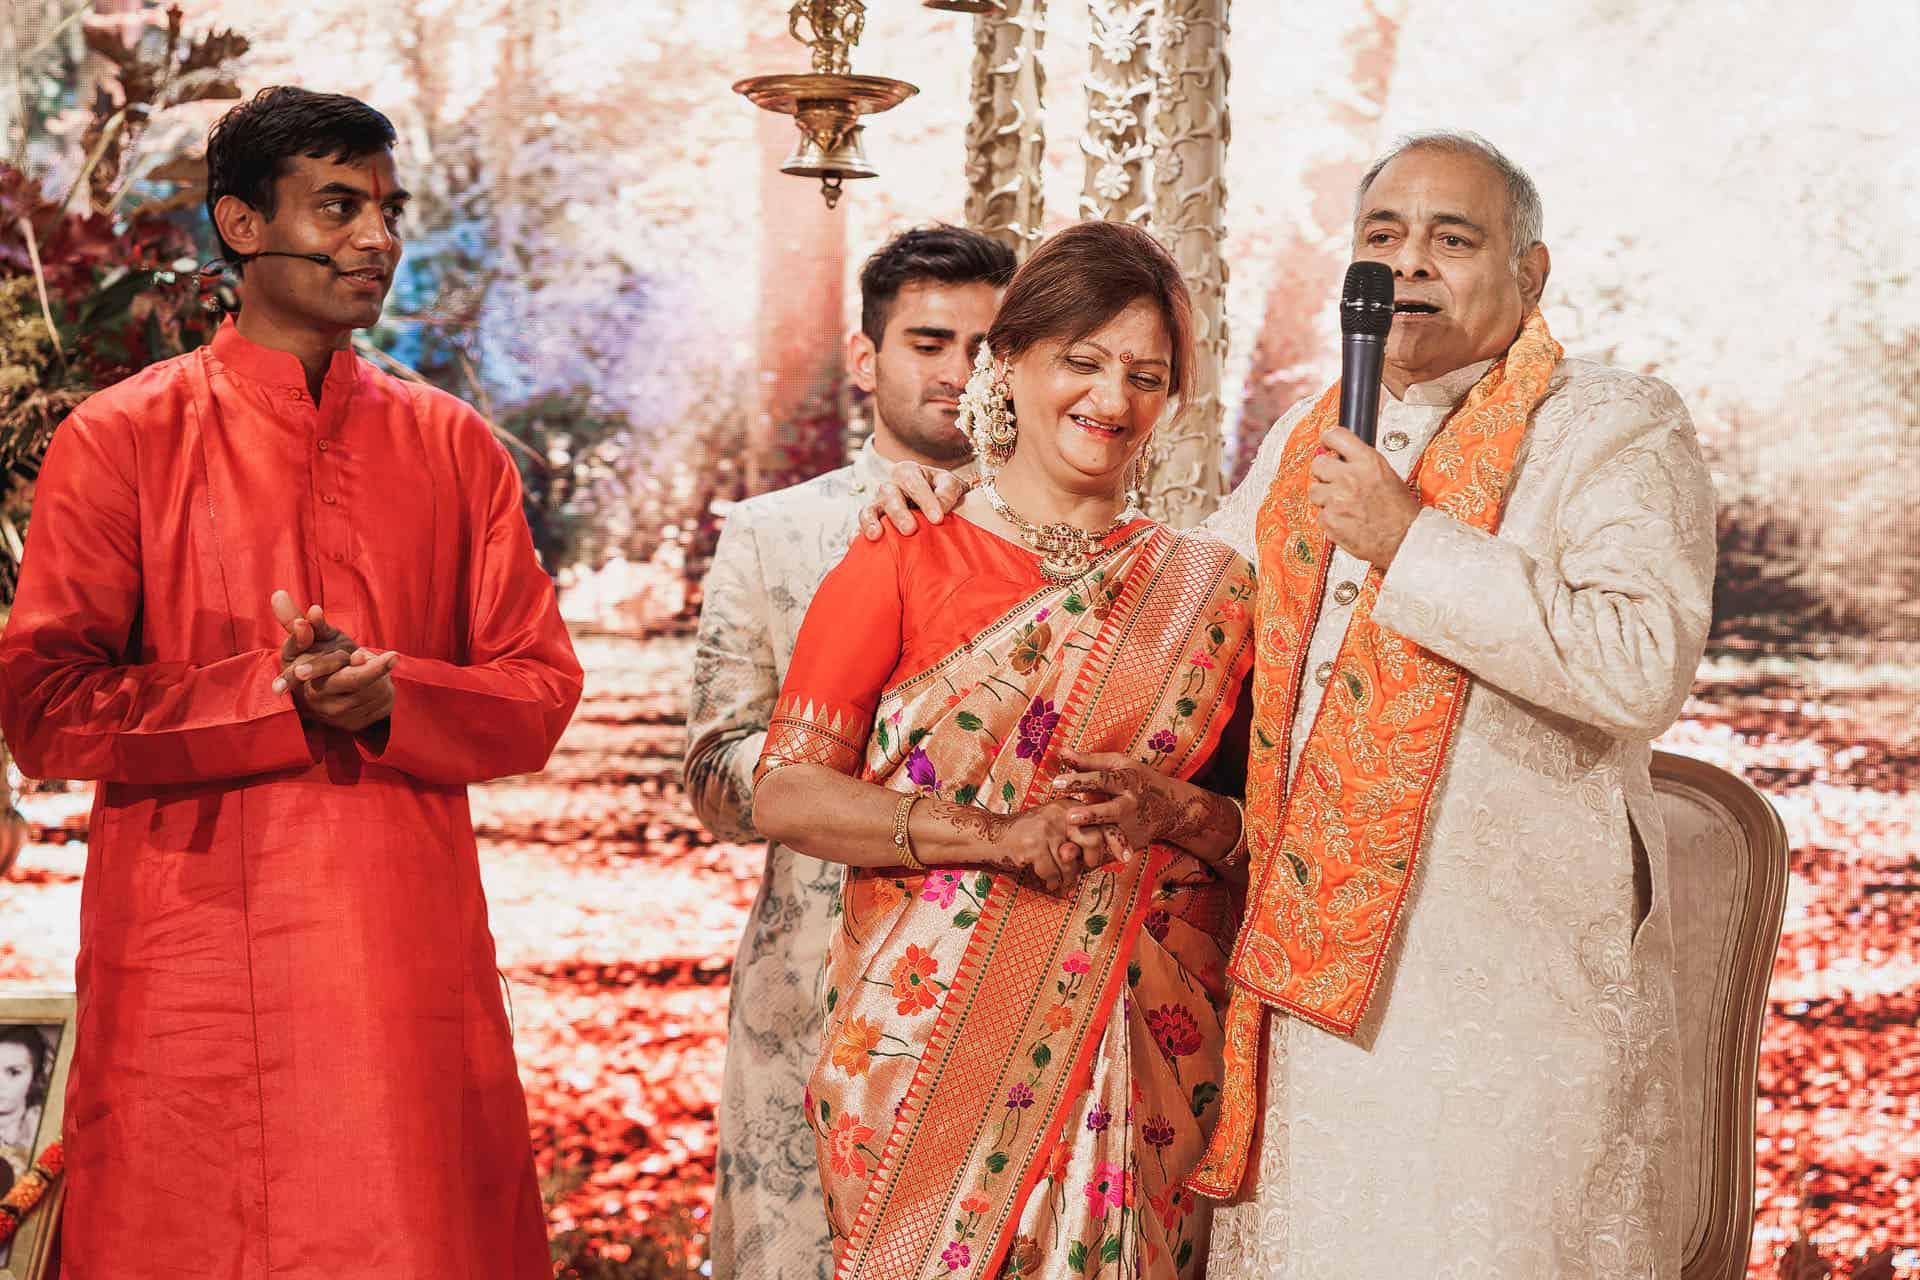 sofitel heathrow hindu wedding photography